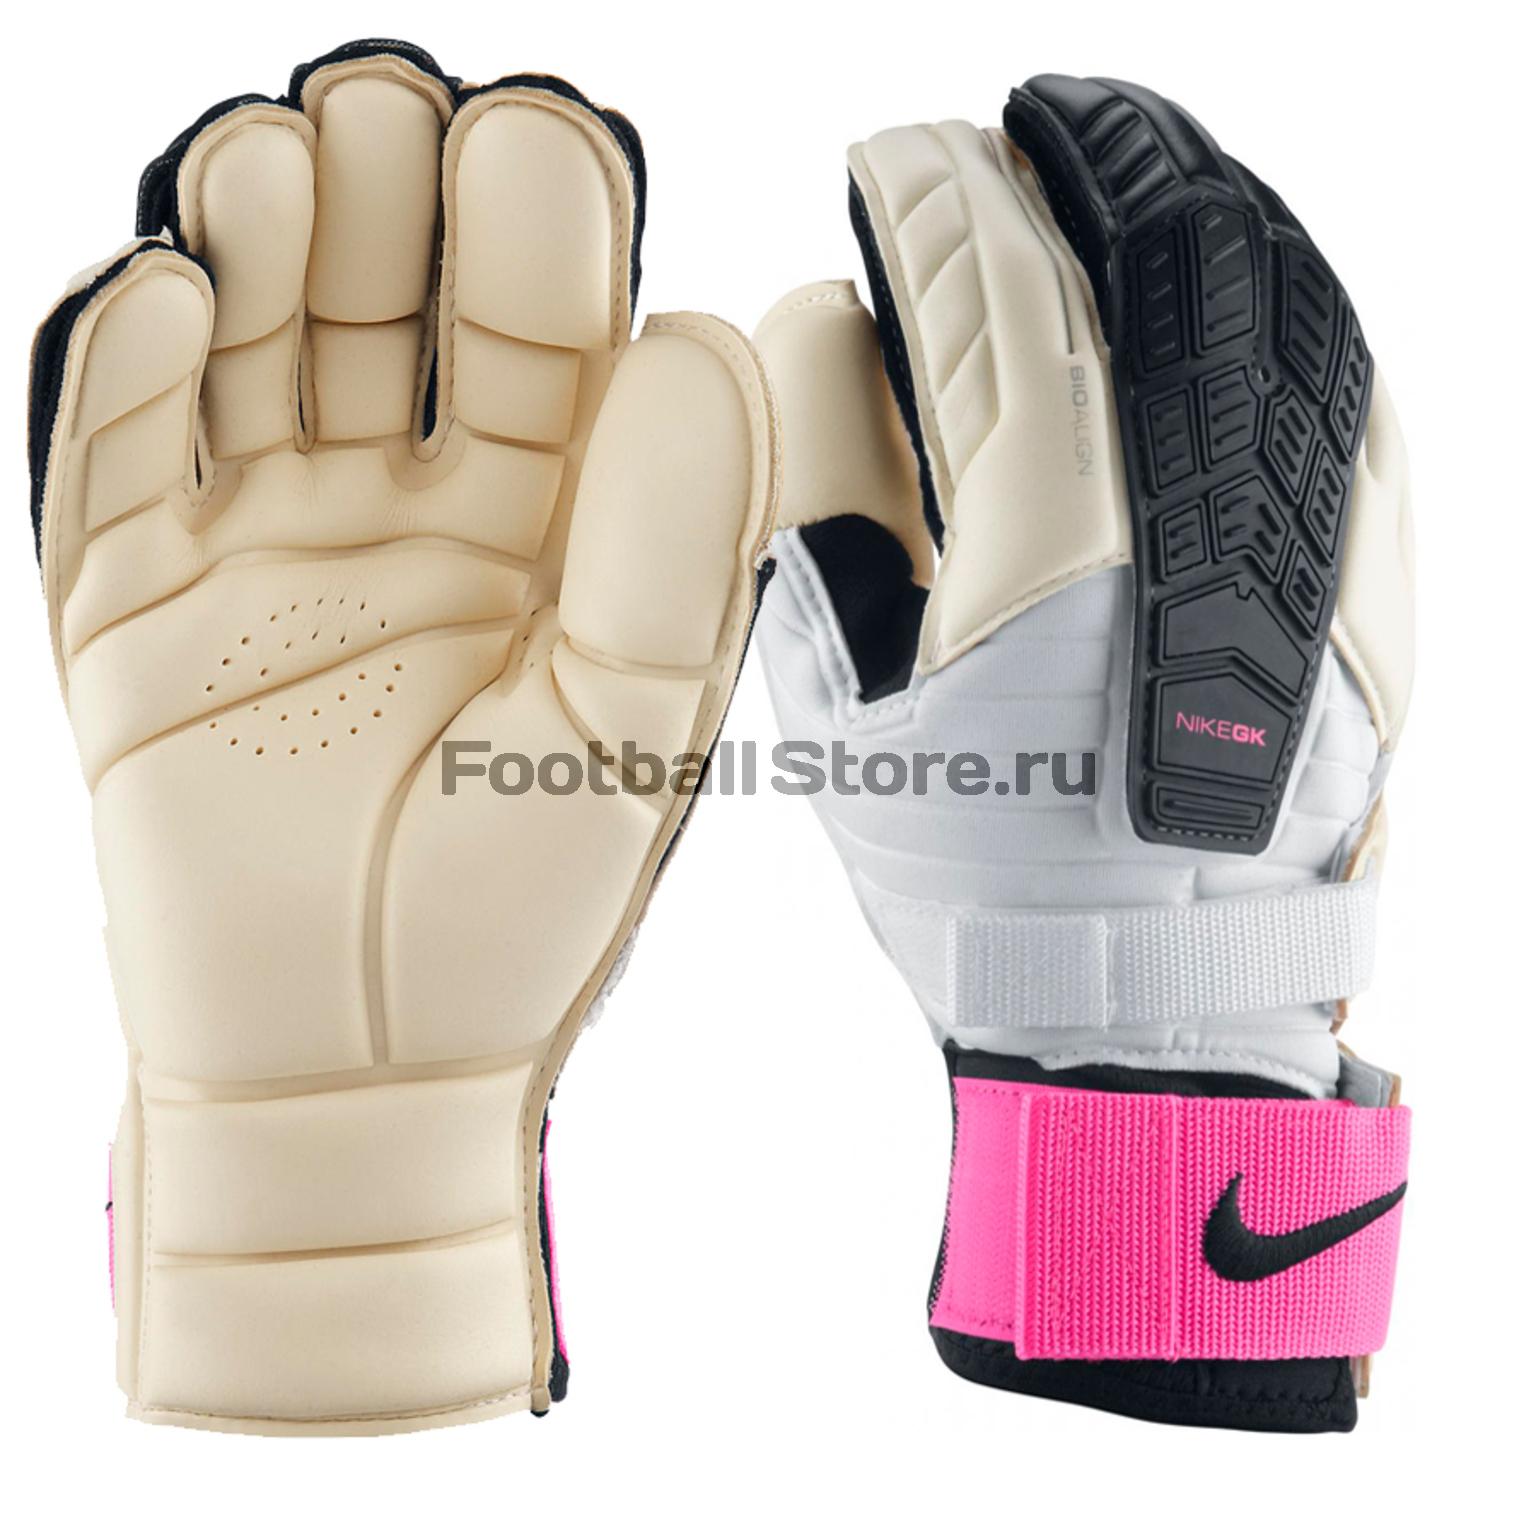 Перчатки Nike Вратарские перчатки Nike GK Confidence GS0249-165